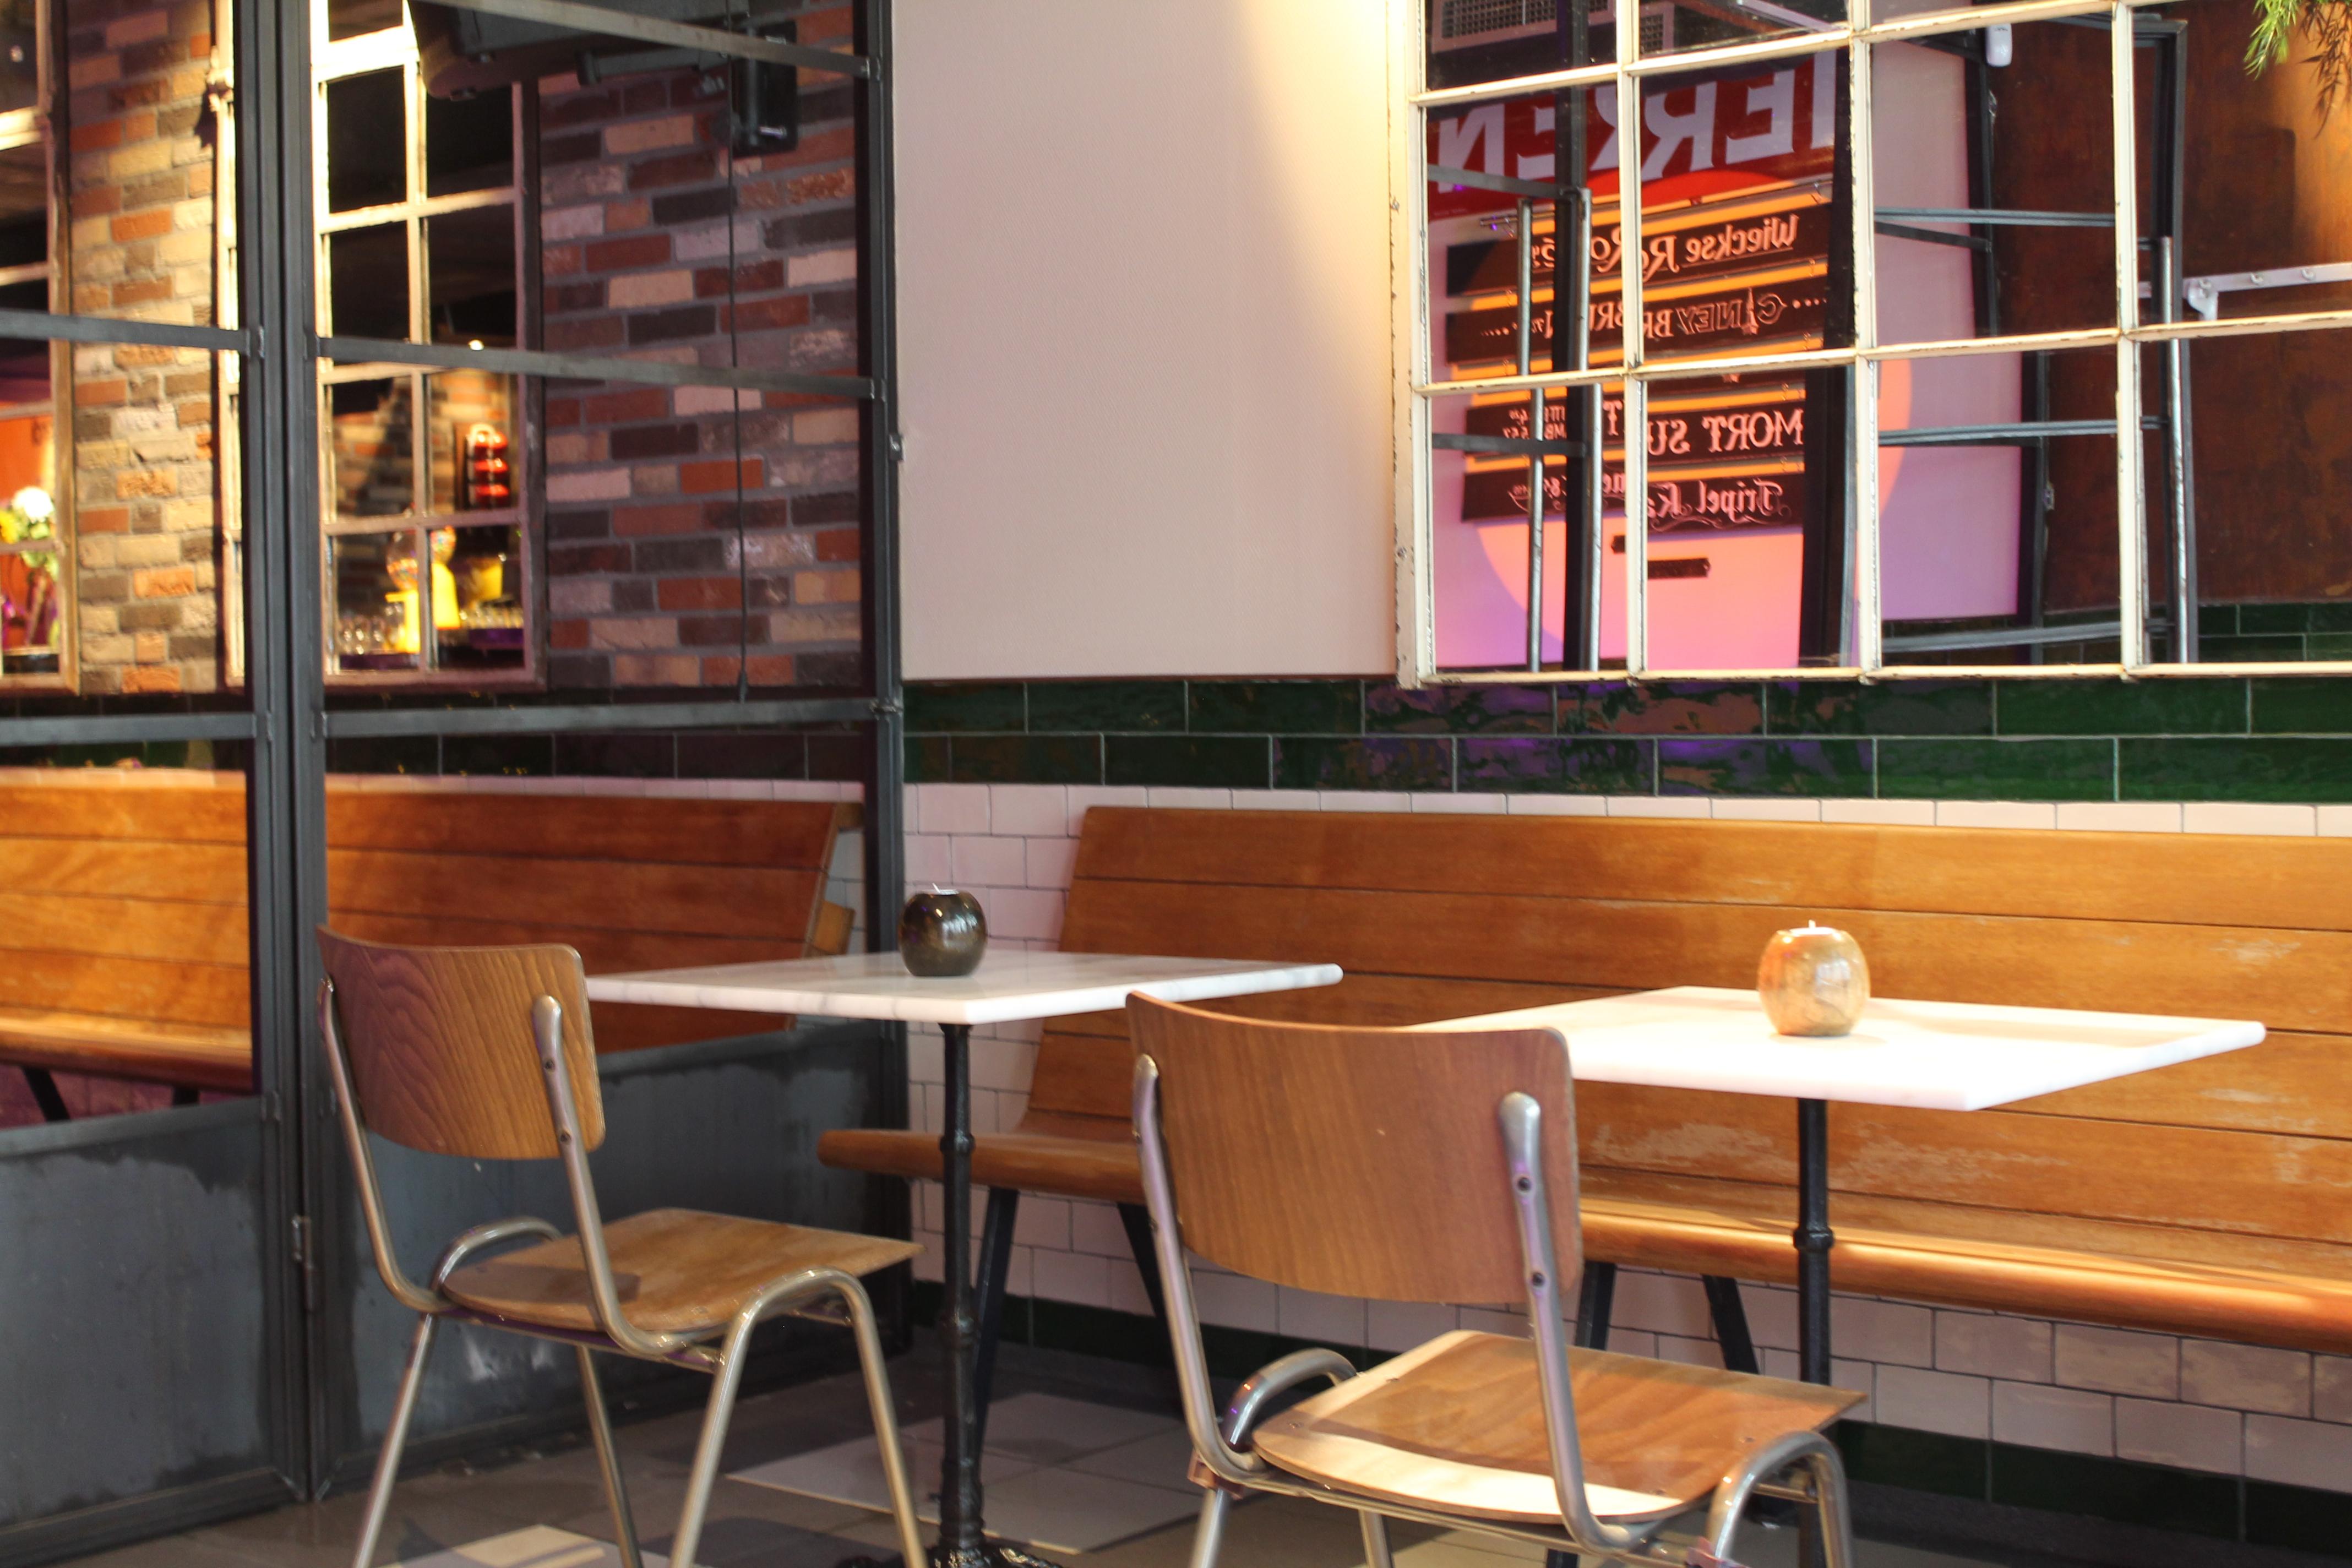 Eten en drinken in Café Lalalaa in Den Bosch